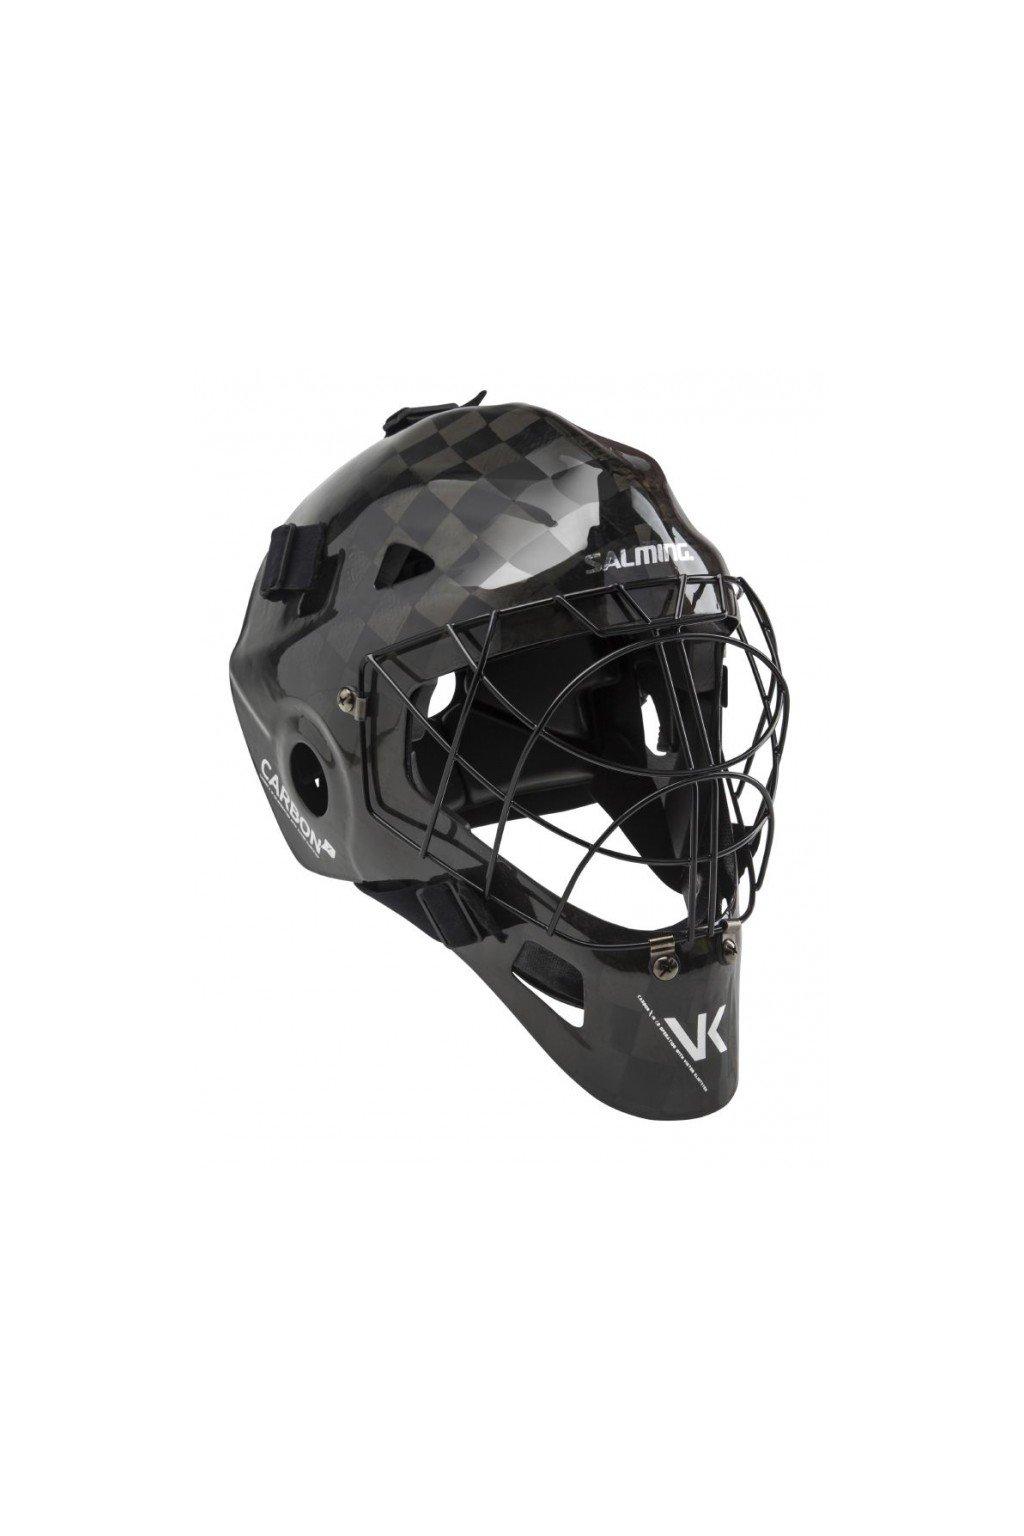 salming carbonx helmet vk edt black